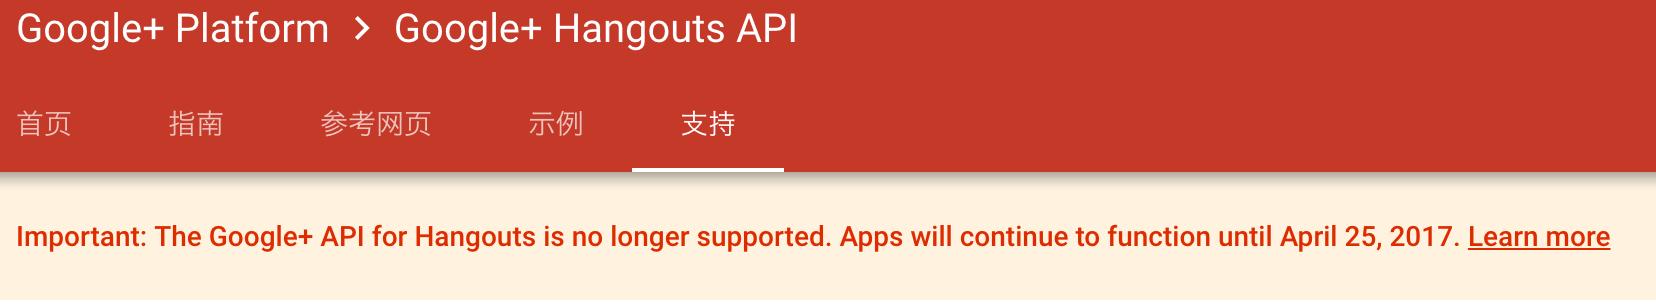 Google 将于4月25日关闭 Hangouts API-芊雅企服